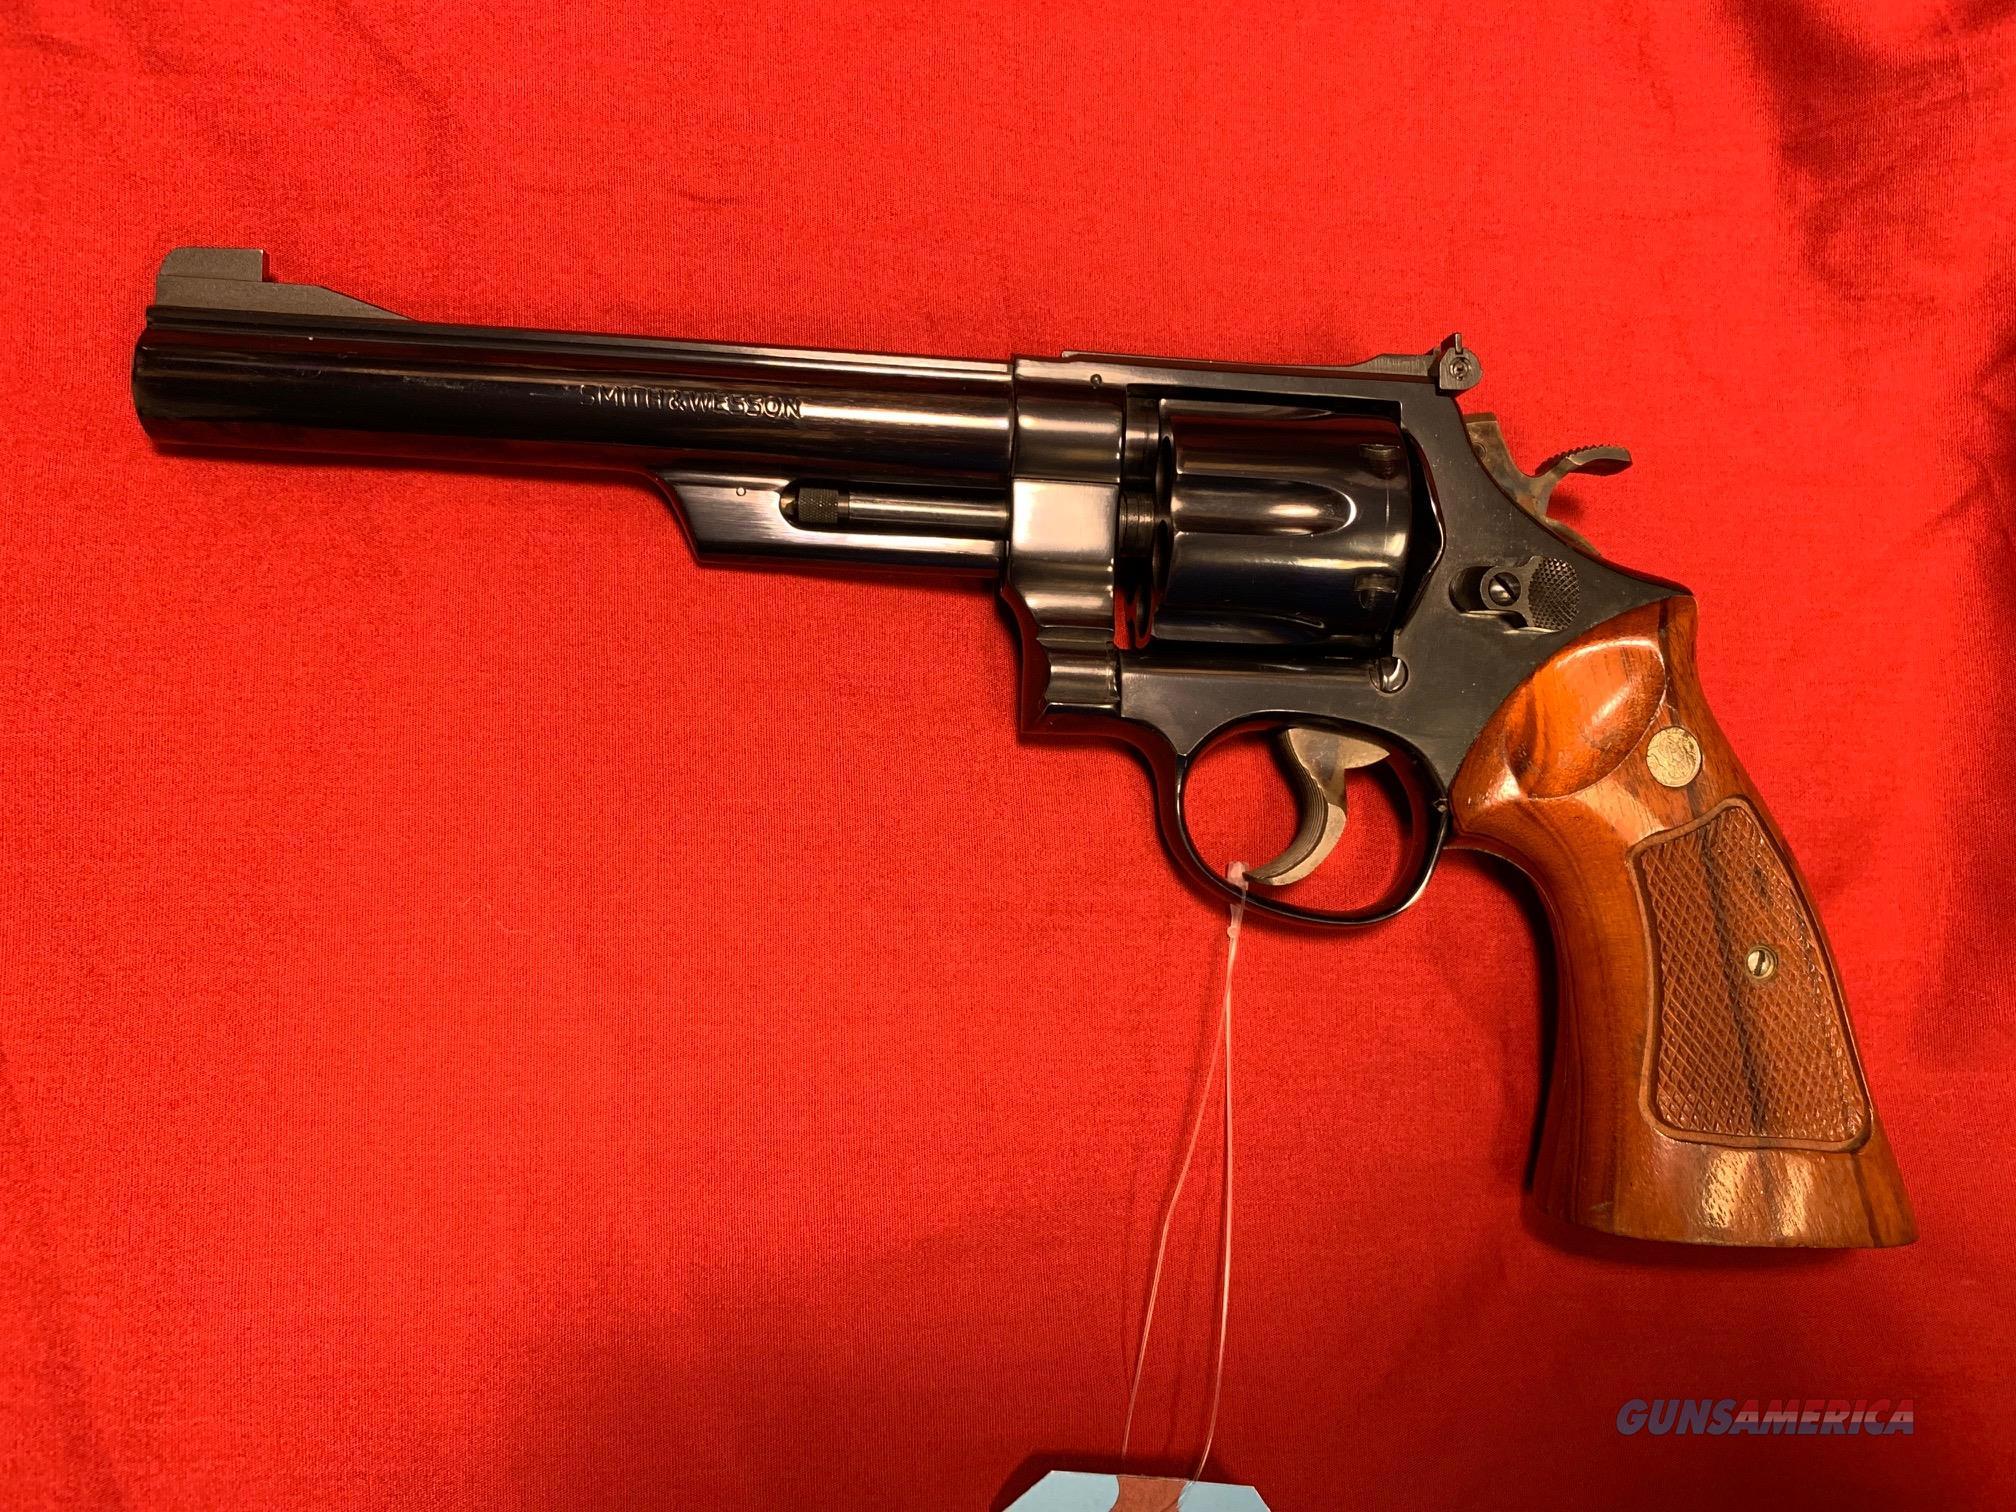 "Smith & Wesson 25-2 45ACP 6.5"" barrel  Guns > Pistols > Smith & Wesson Revolvers > Full Frame Revolver"